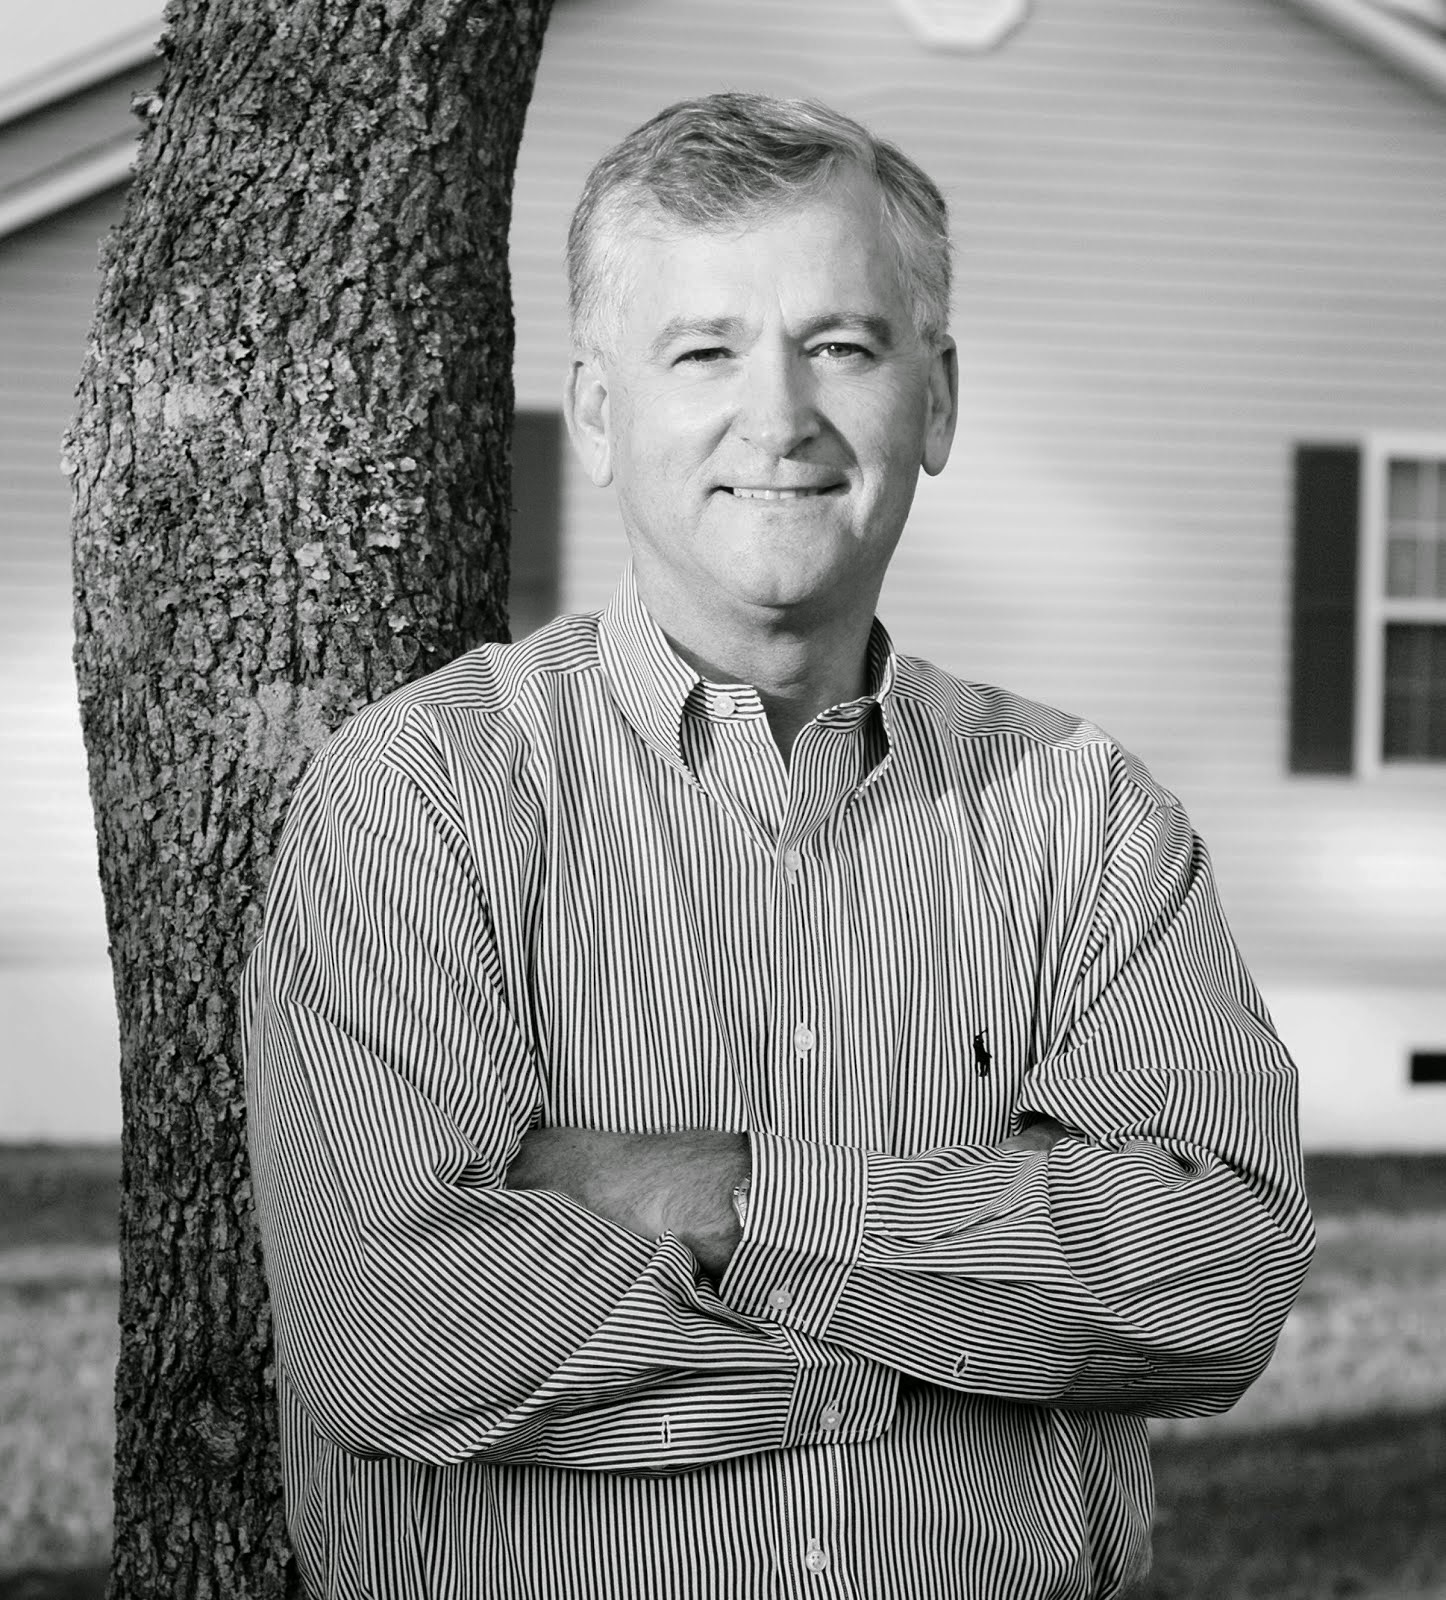 Joel G Hancock